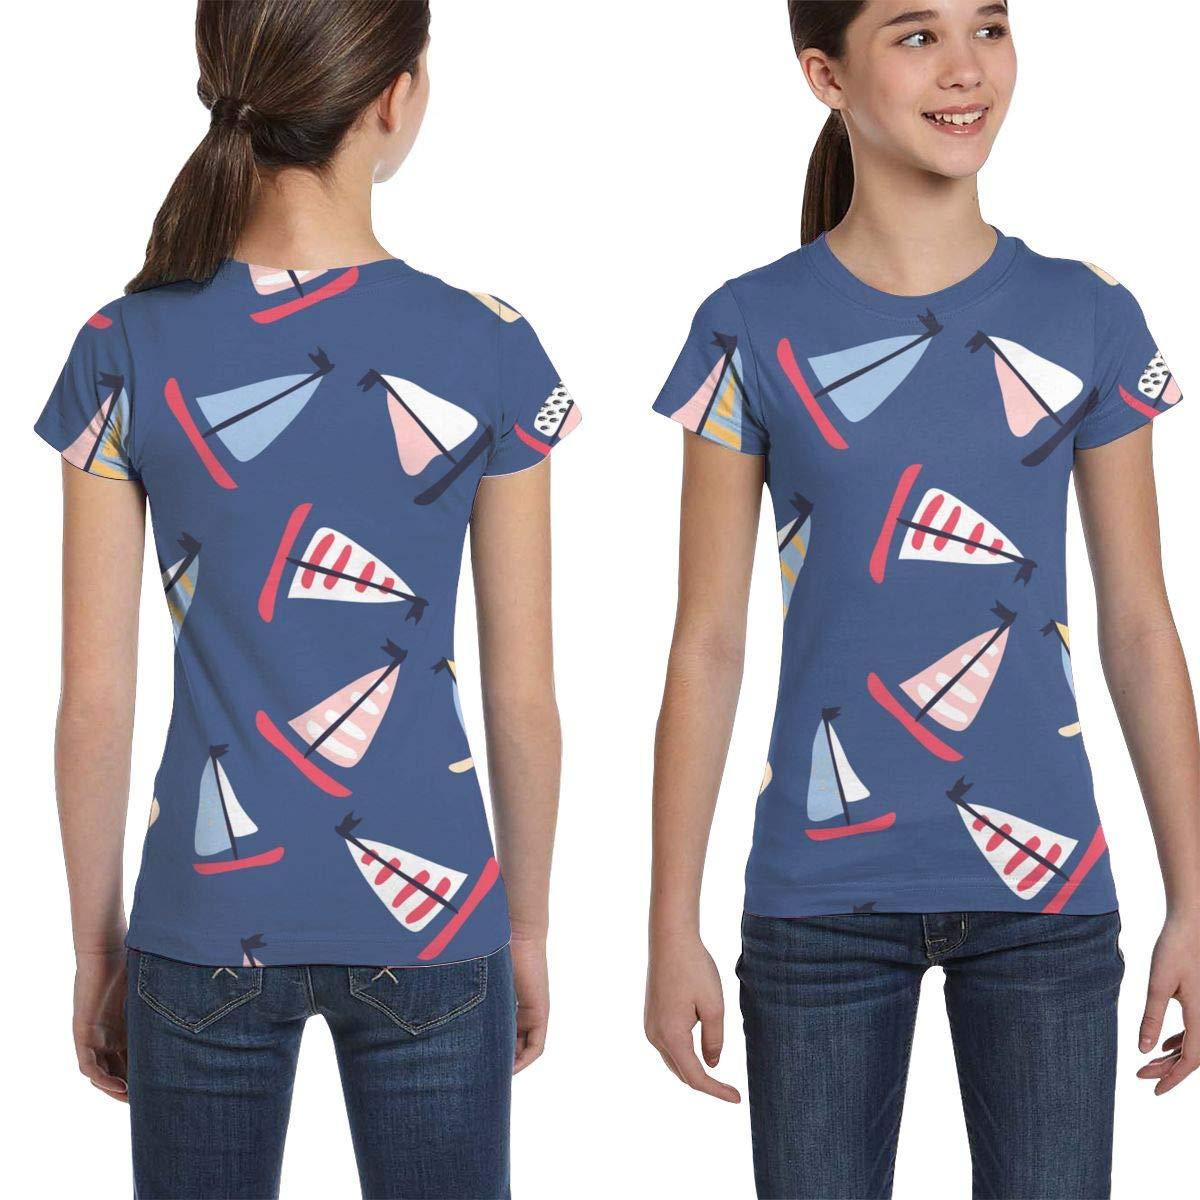 XS-XL L6Nv4o@A Girls Short Sleeve Sailing Yachts T-Shirts Casual Blouse Clothes